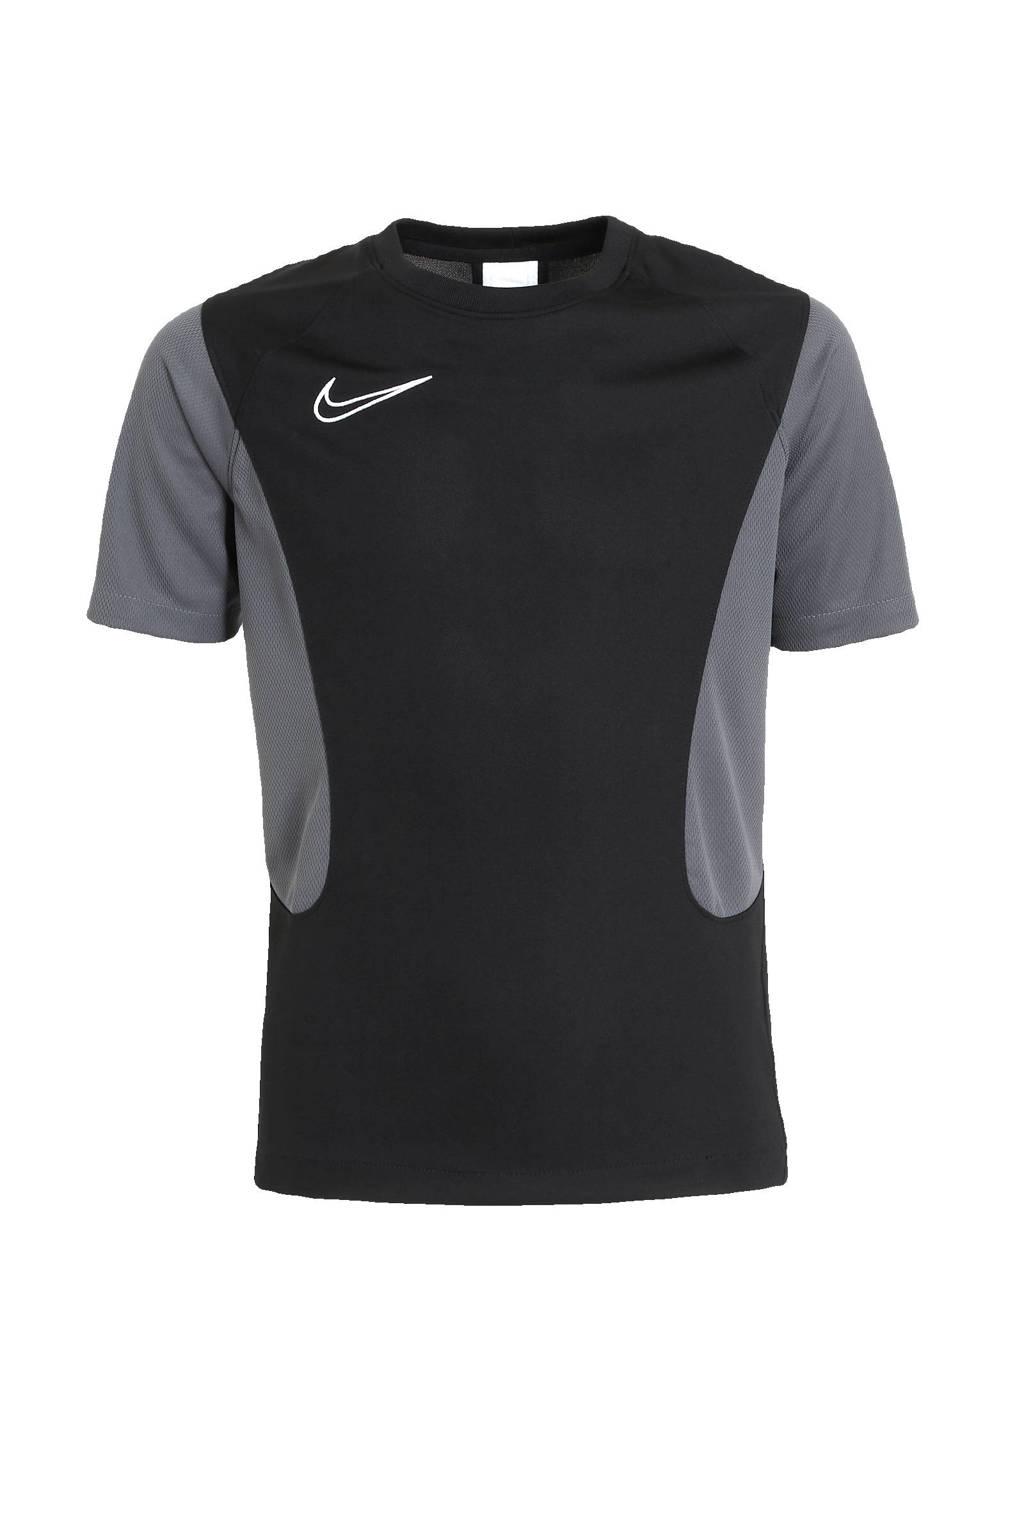 Nike Junior  voetbalshirt zwart/donkergrijs/wit, Zwart/donkergrijs/wit